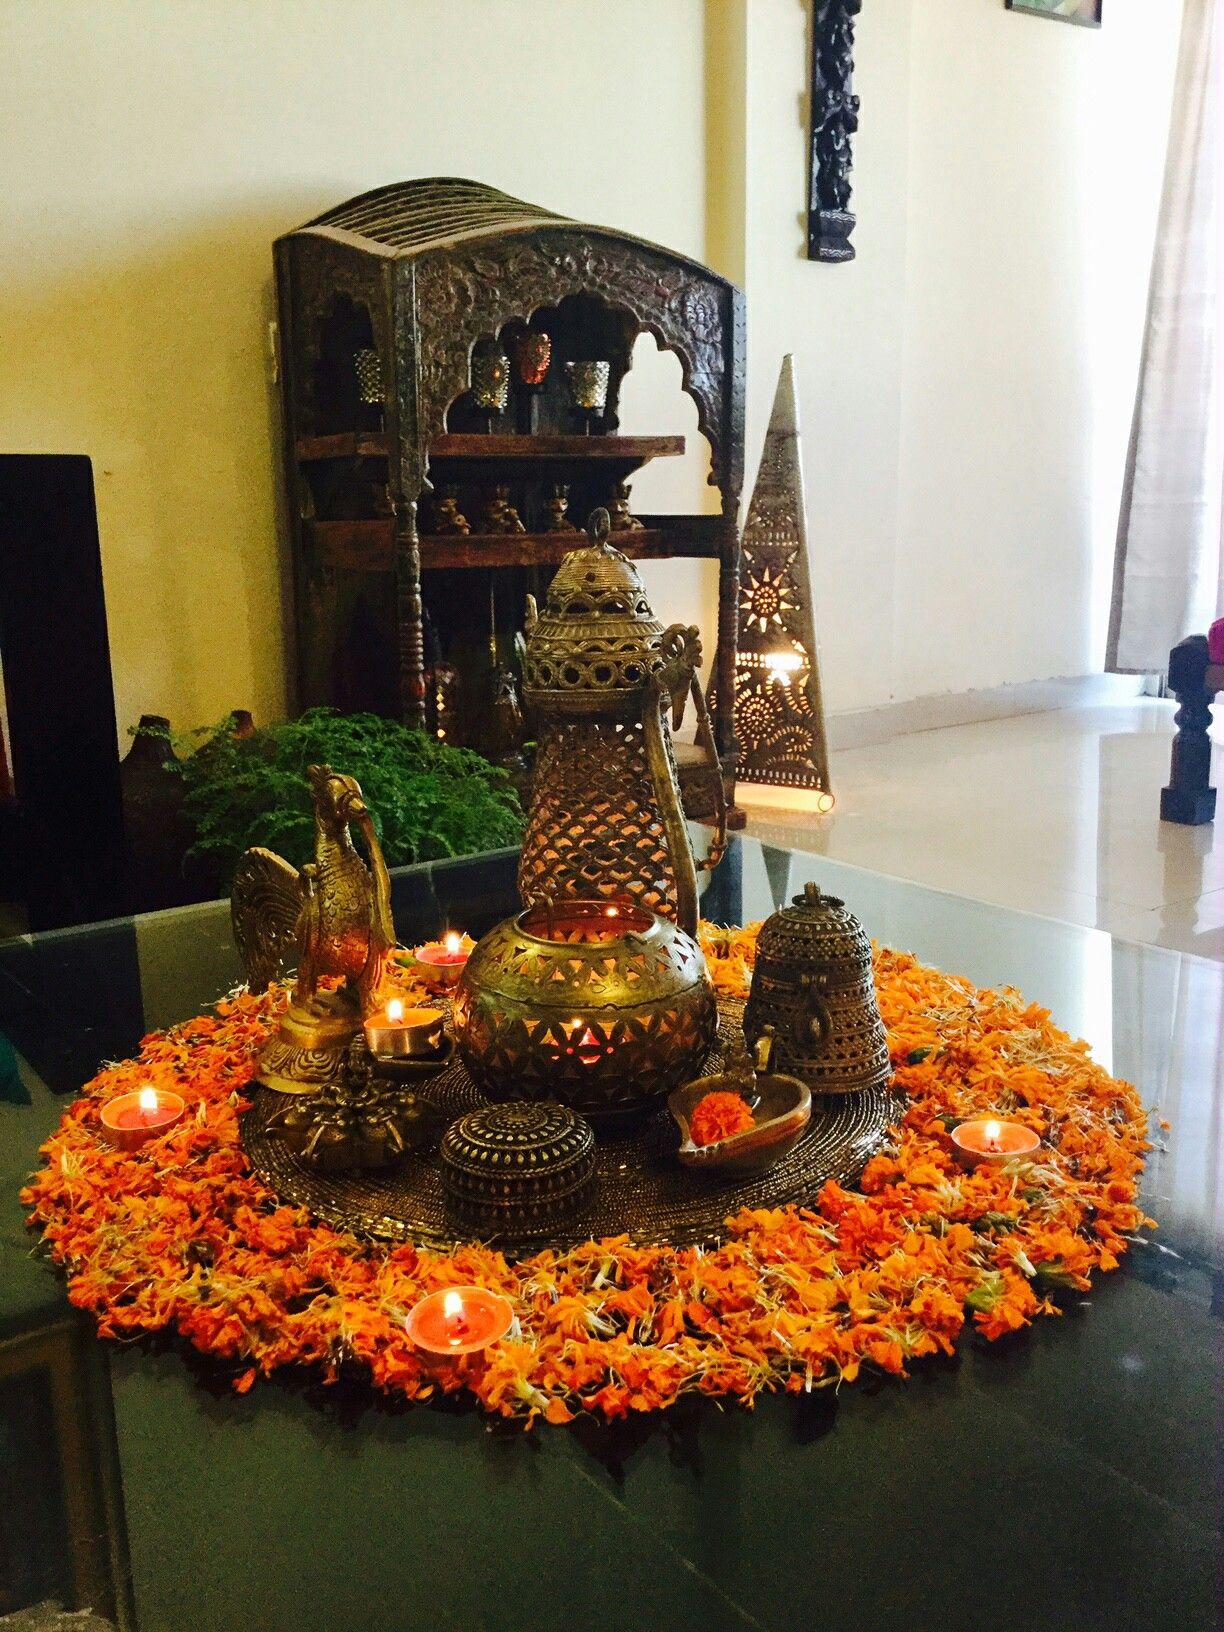 Diwali decor my home | Diwali decorations, Decor, Indian